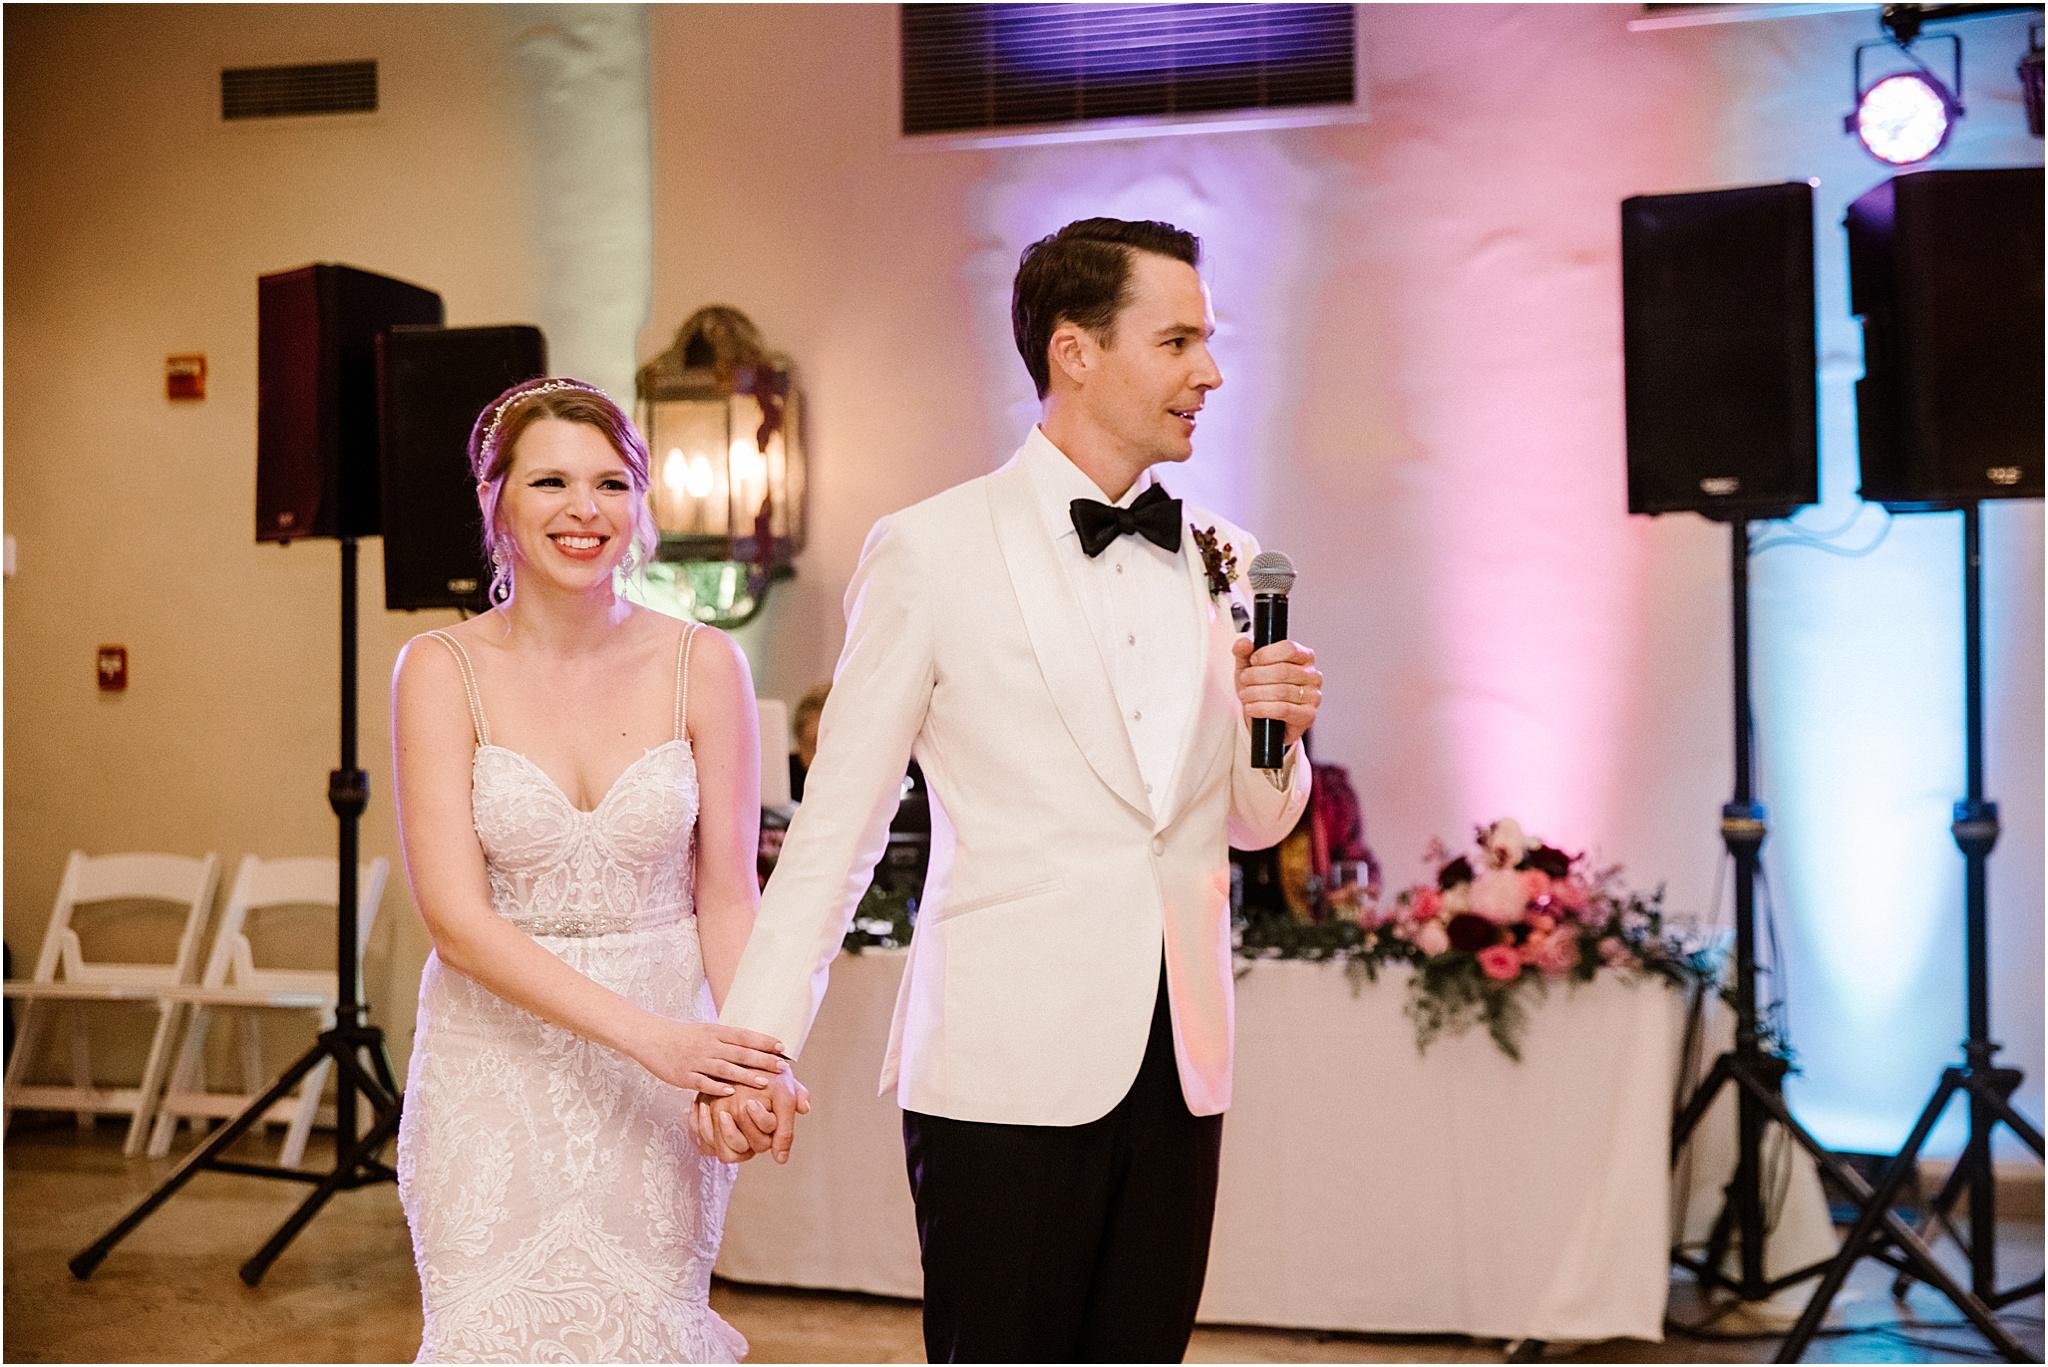 BLUE ROSE PHOTOGRAPHY SANTA FE WEDDING_69